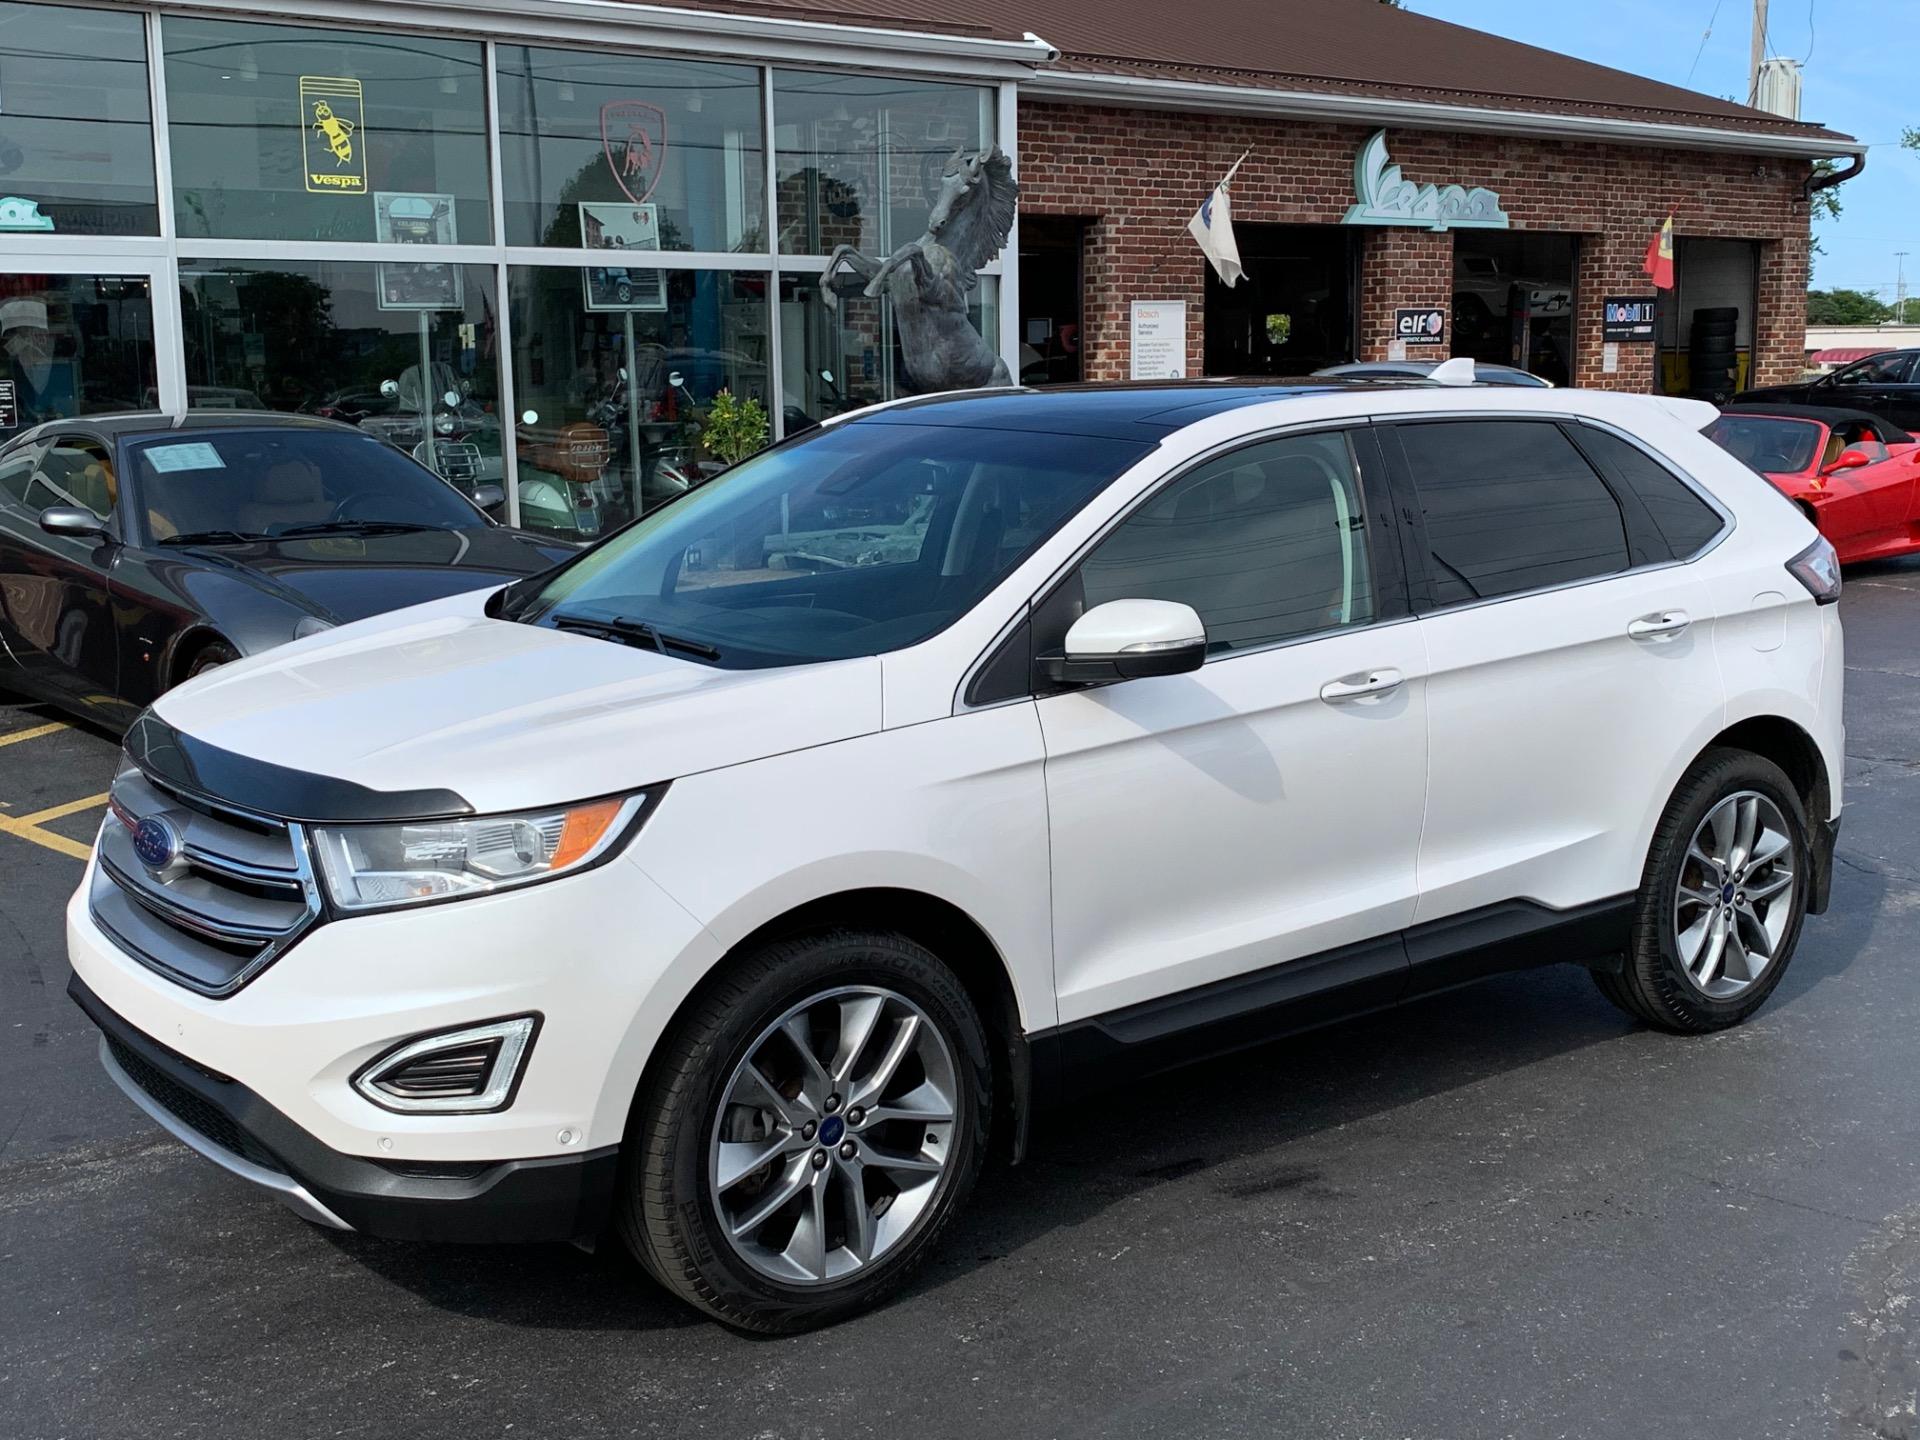 Used-2016-Ford-Edge-Titanium-AWD